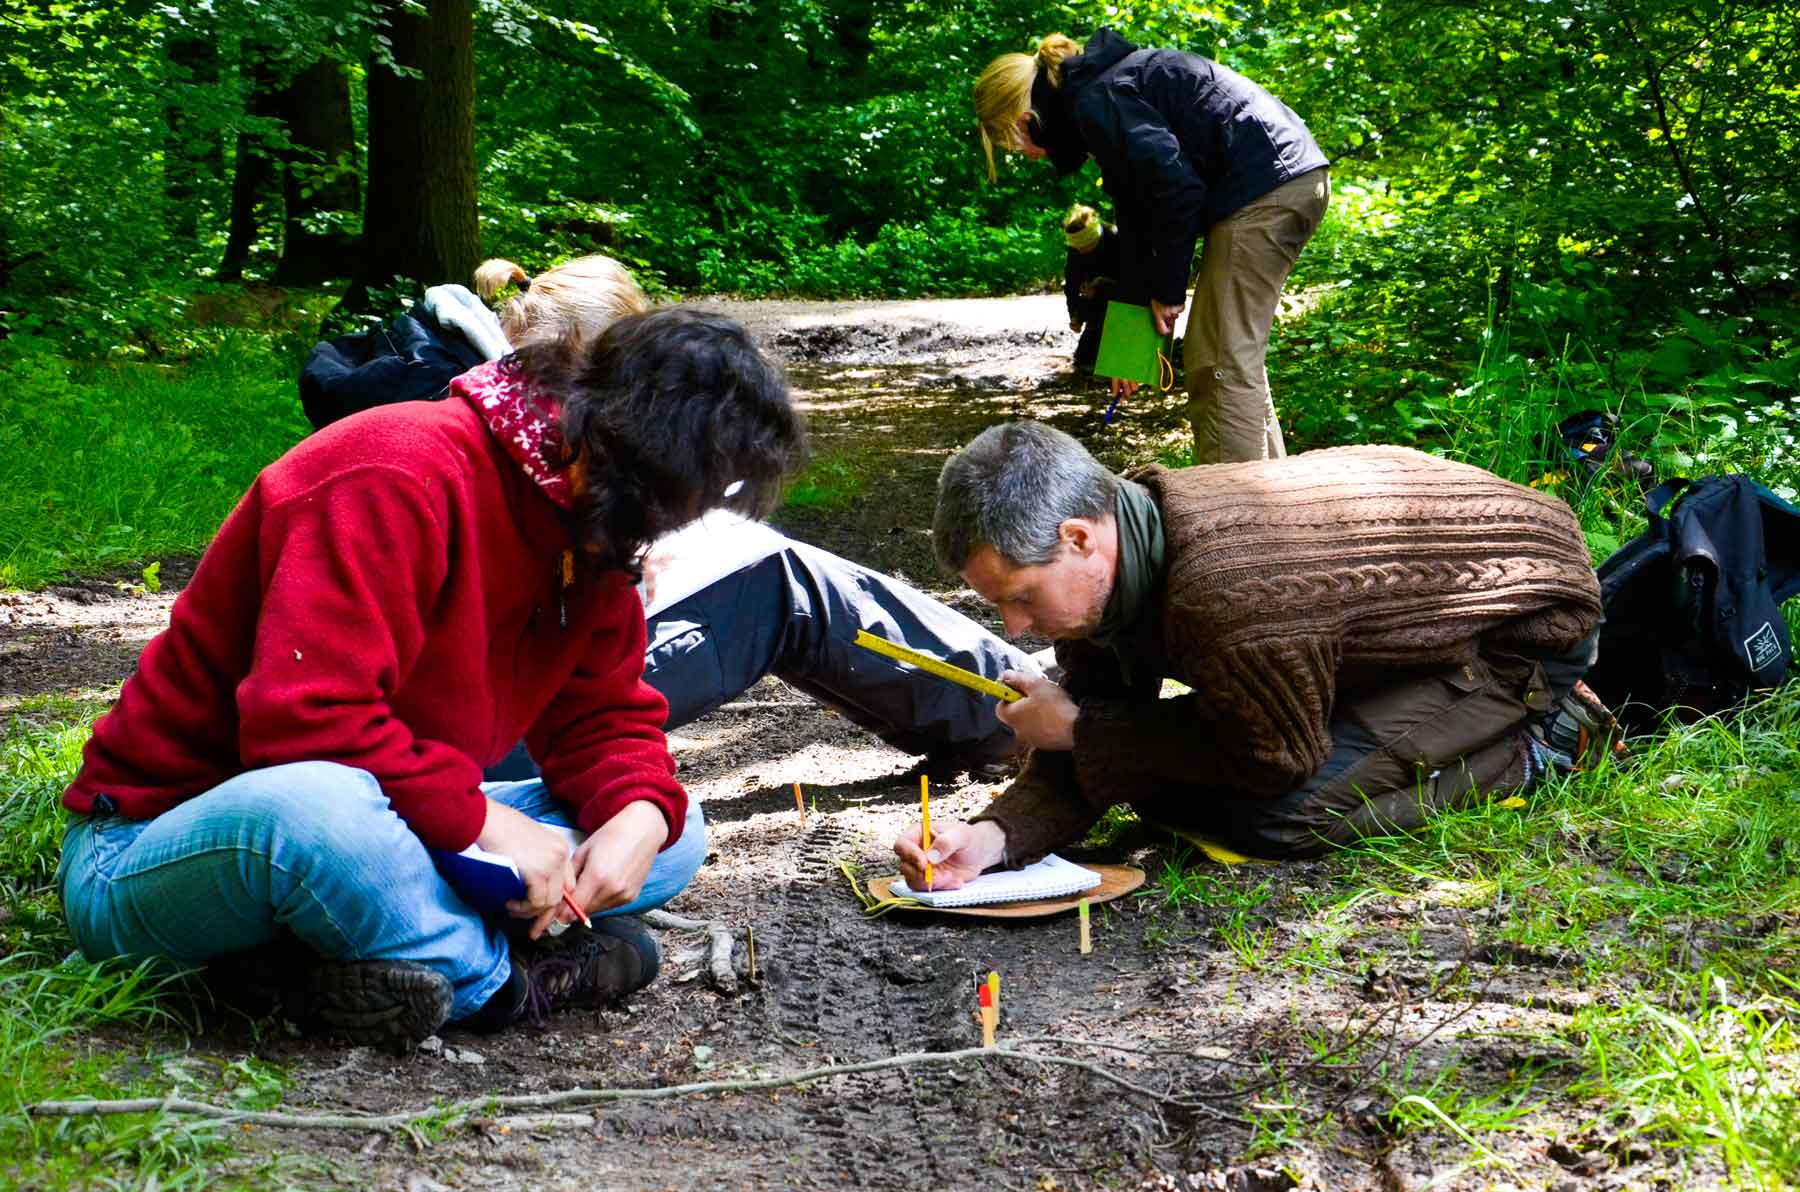 Wildnispaedagogik Ausbildung Spurenlesen Tracking